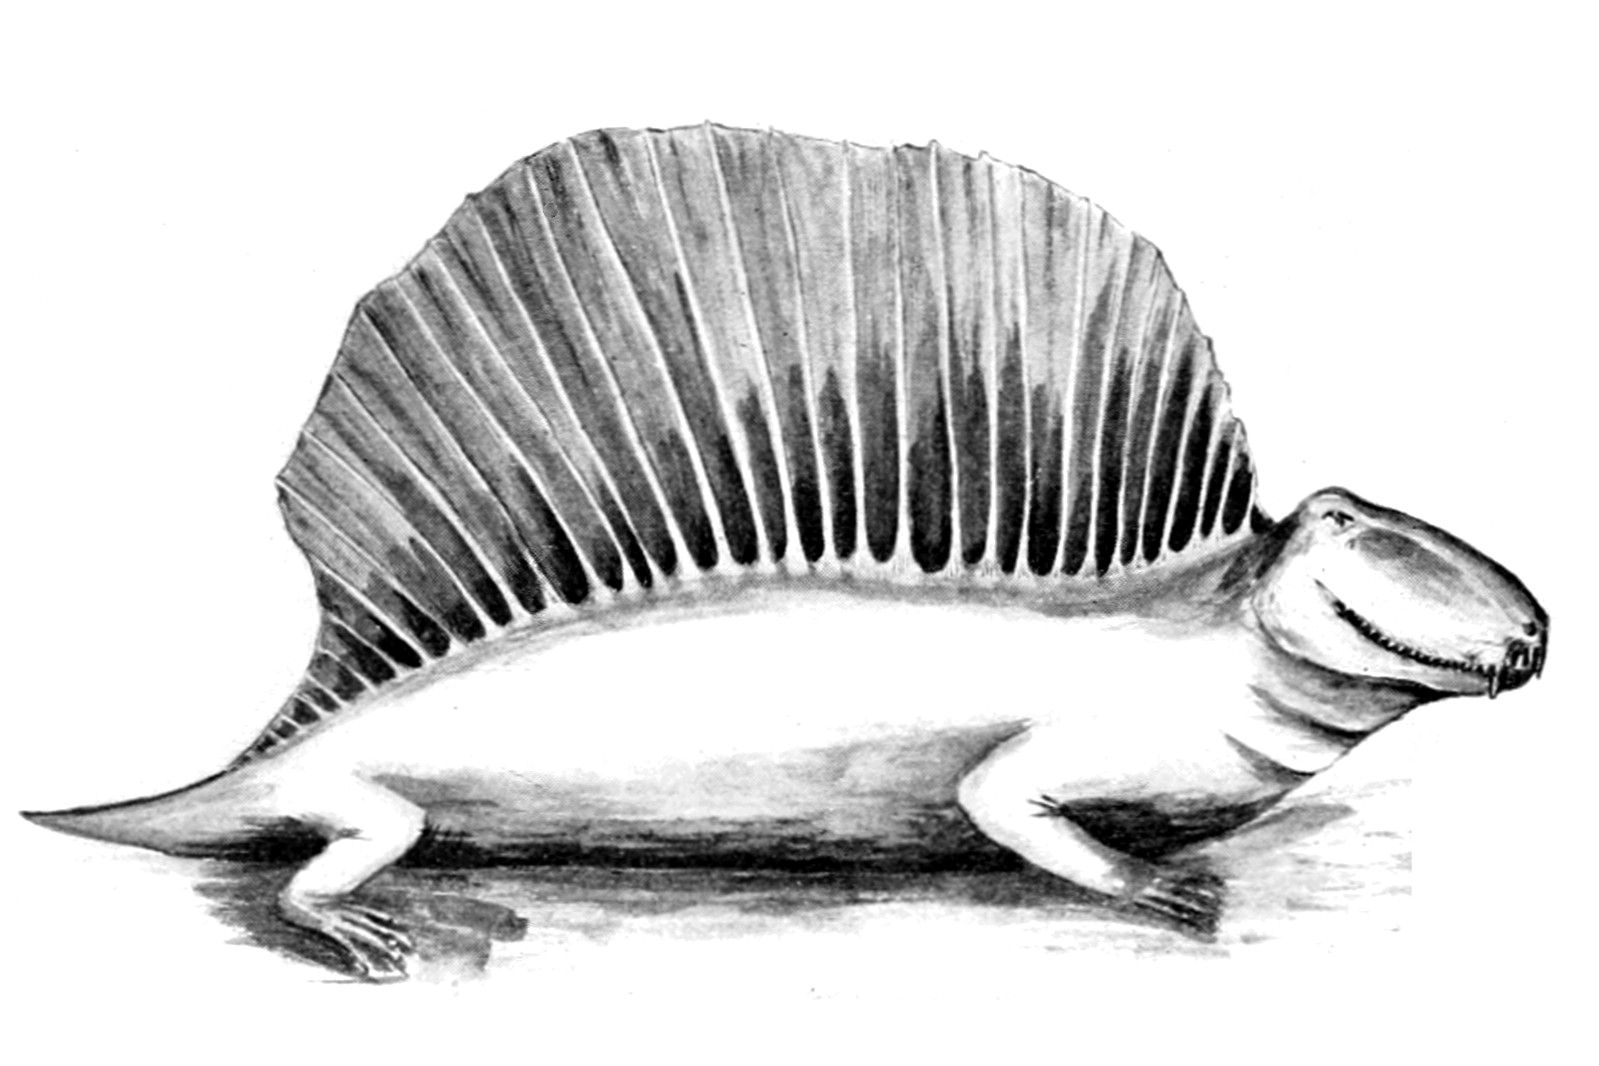 Reconstruction of Dimetrodon from